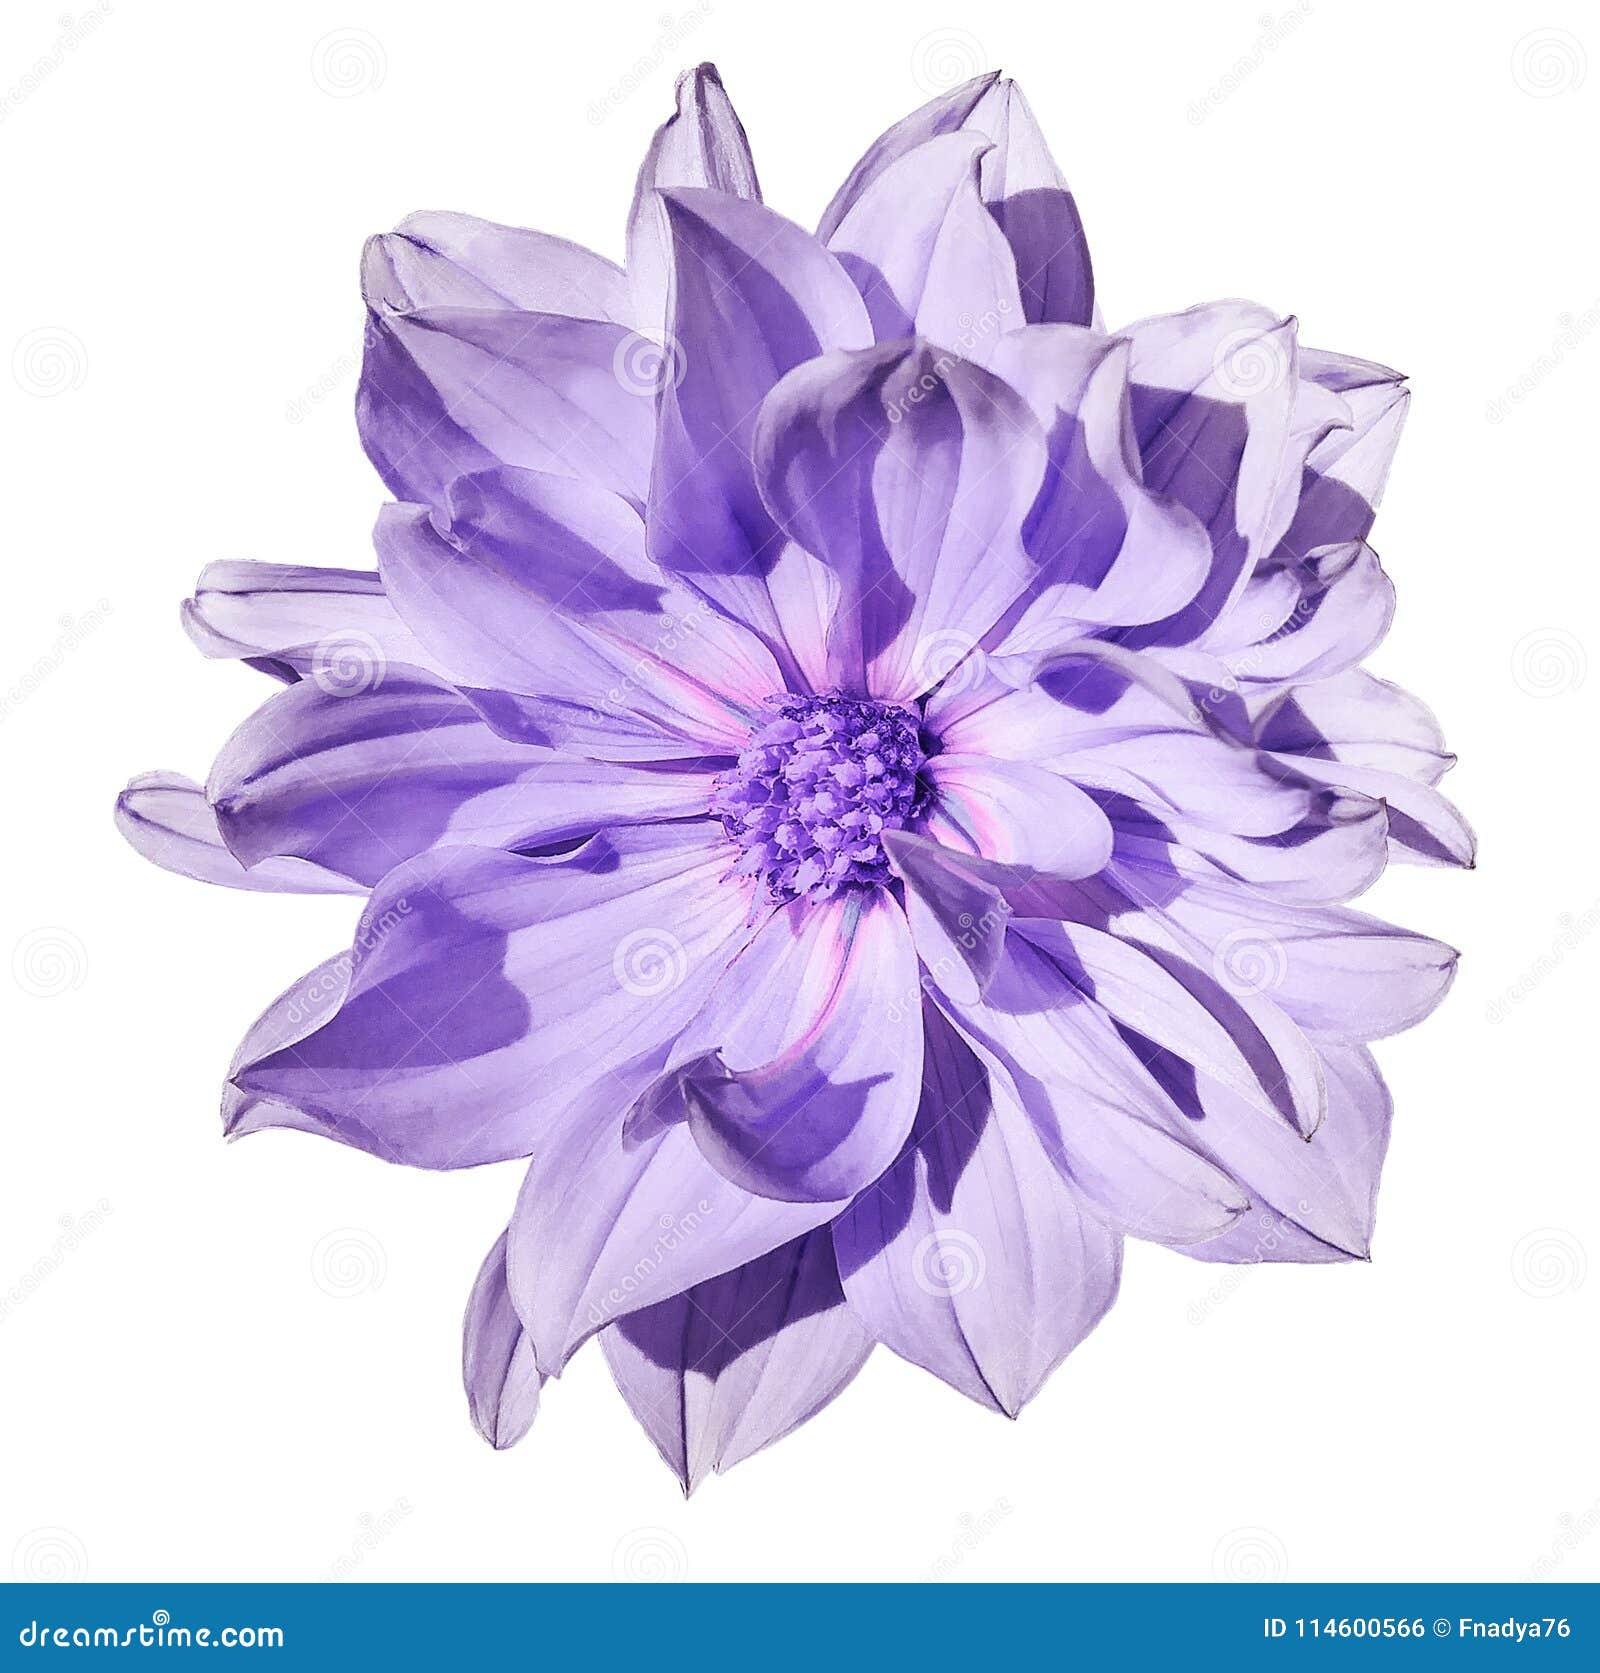 Dahlia light purple flower on an isolated white background with download dahlia light purple flower on an isolated white background with clipping path closeup mightylinksfo